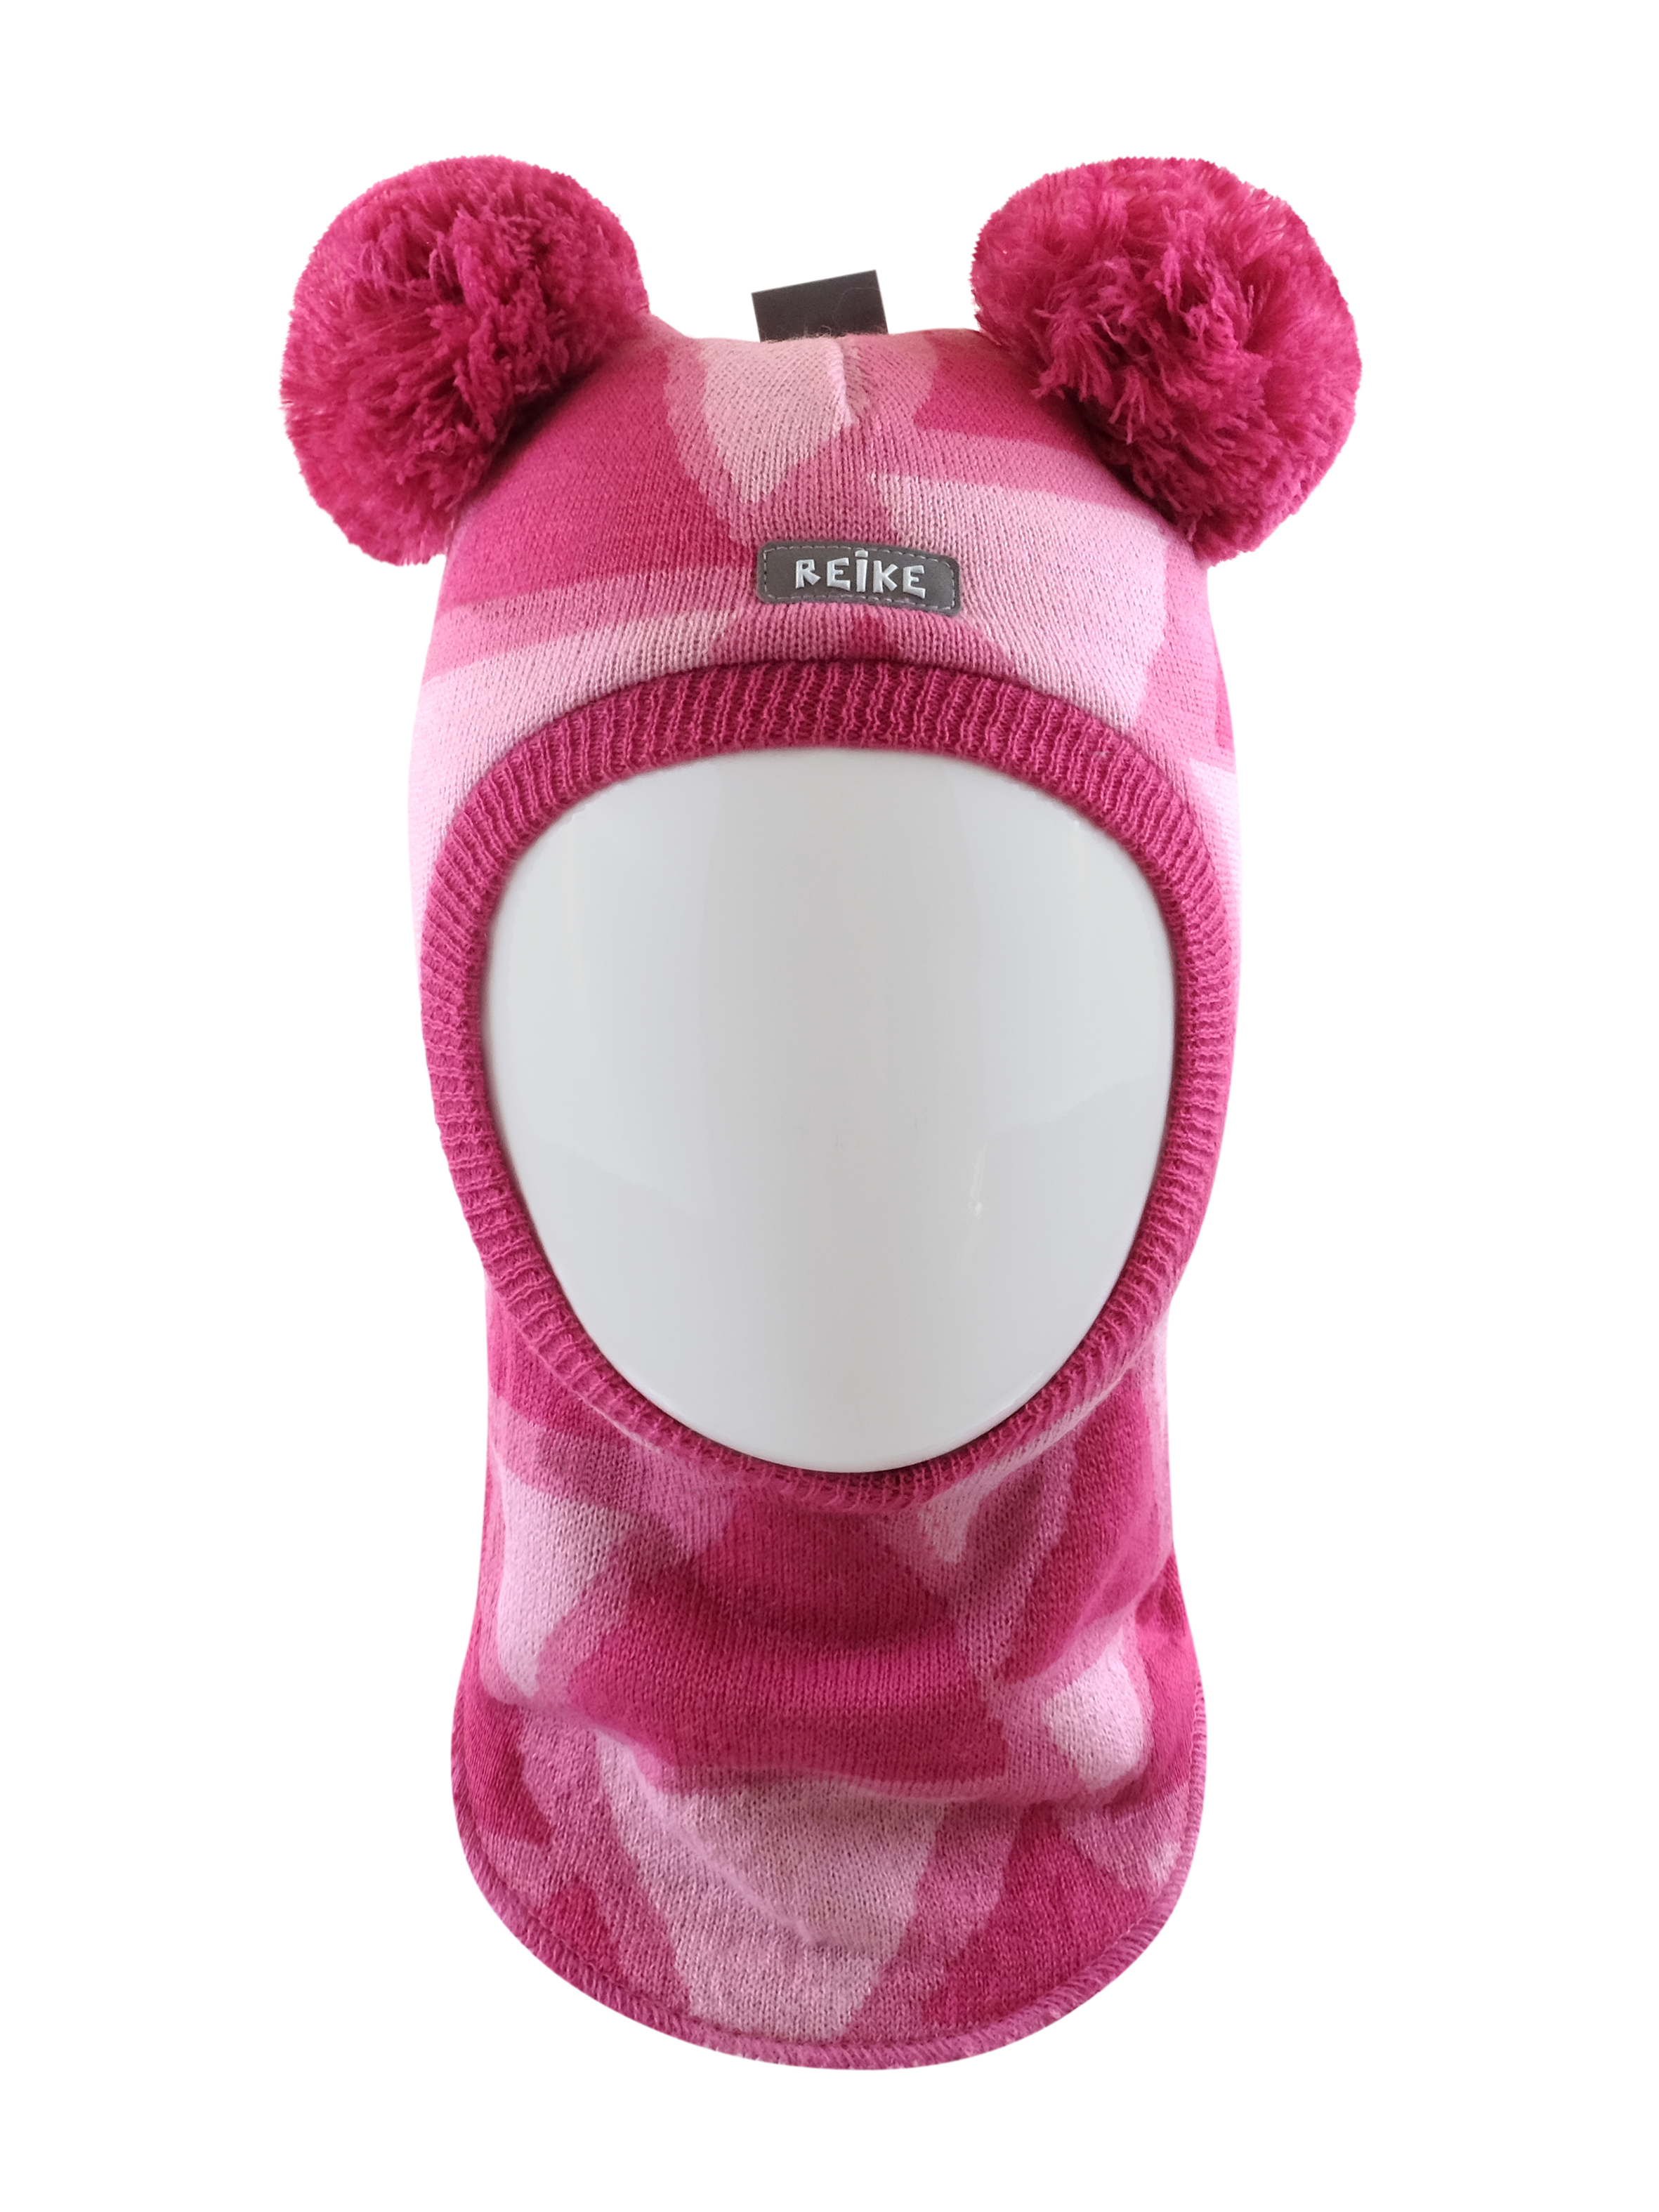 Купить Шапка-шлем для девочки Reike Bunnies fuchsia, RKN2021-1 BNS fuchsia, р.44,